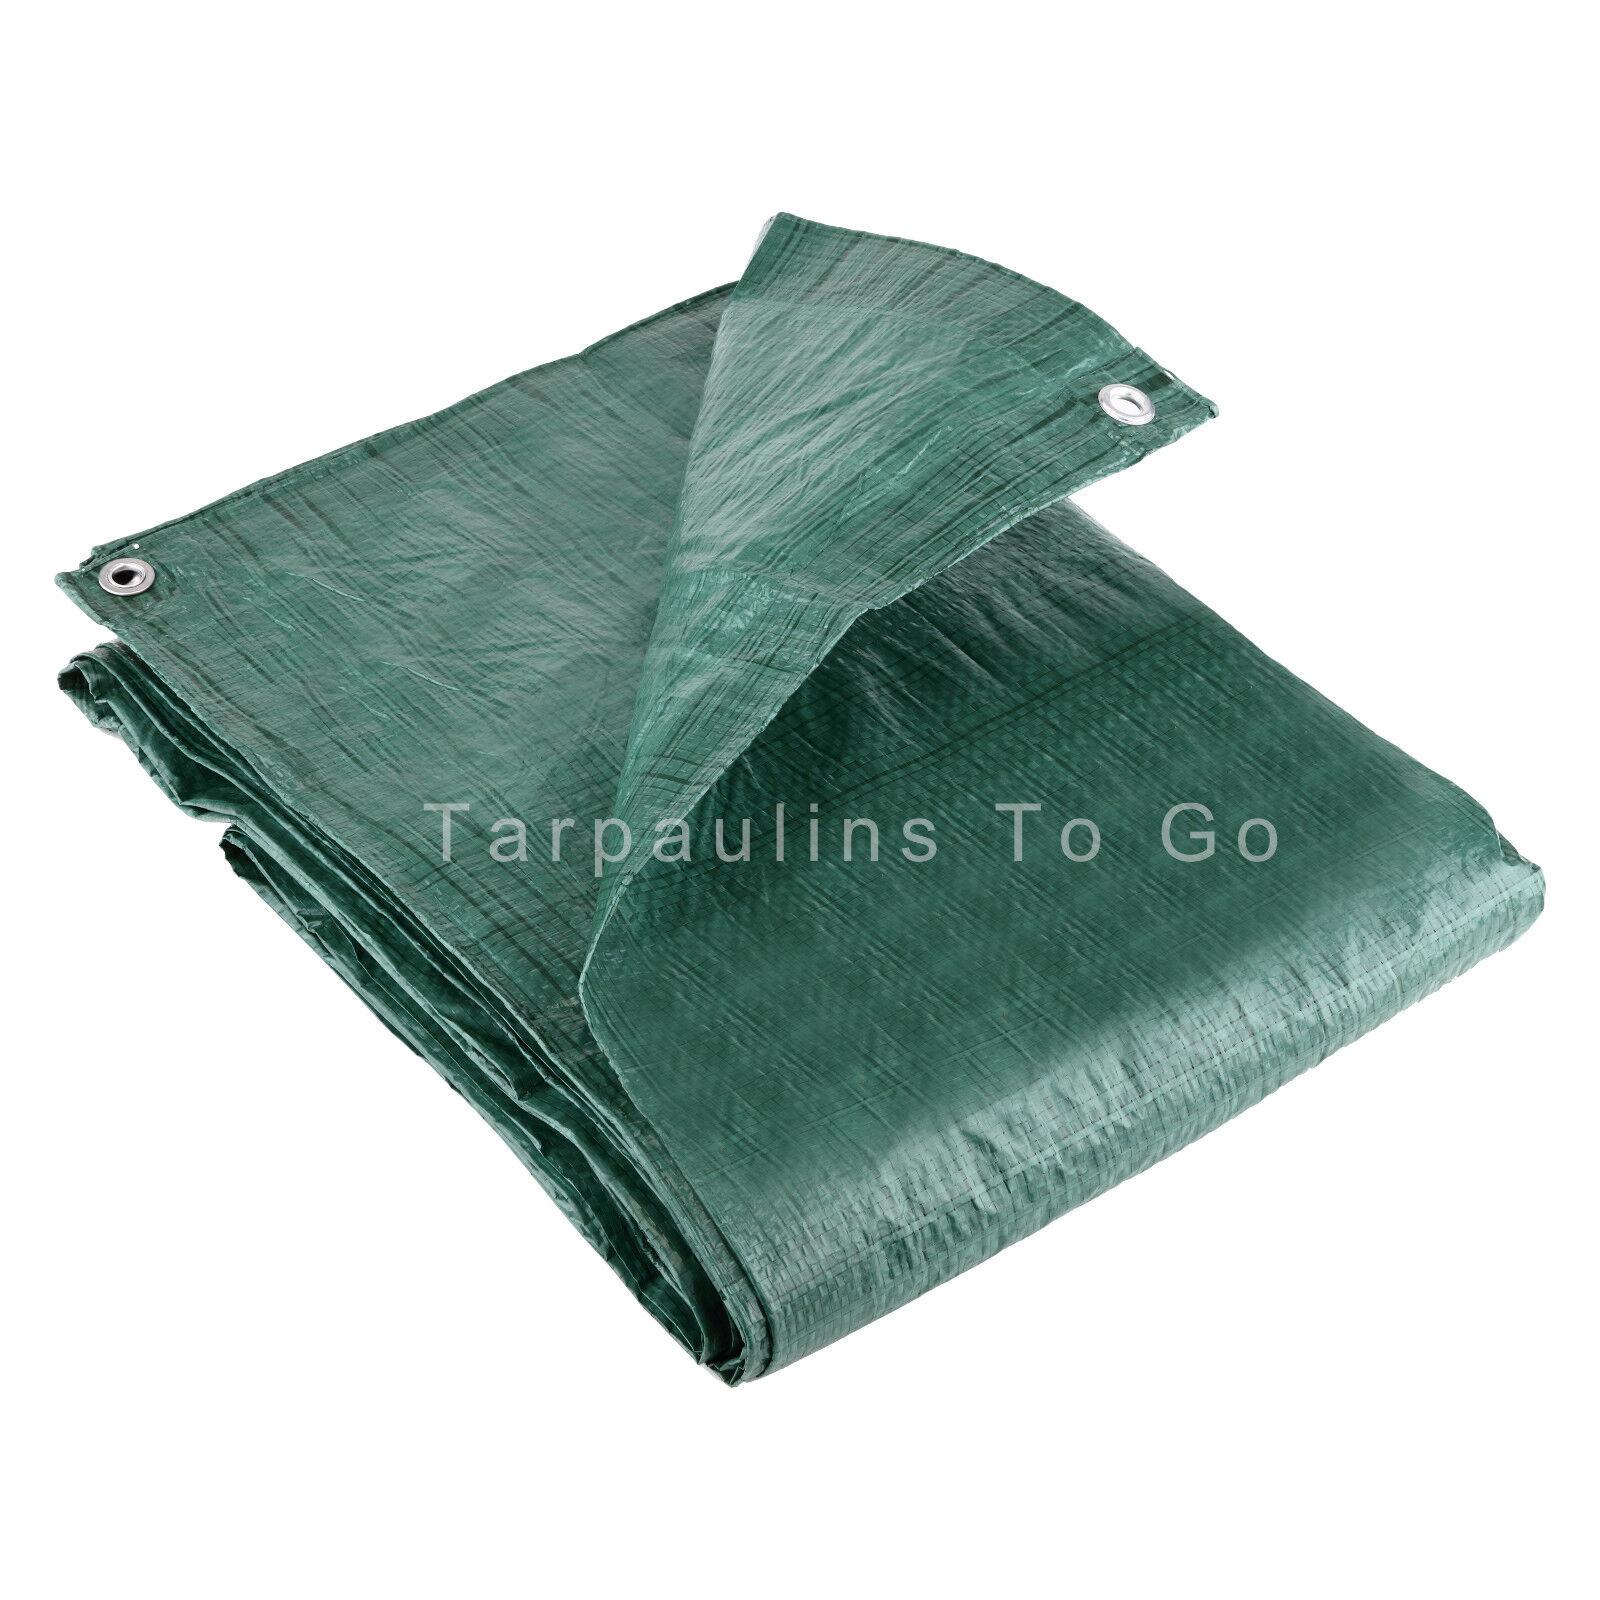 Waterproof Tarpaulin Ground Sheet Lightweight Camping Cover Tarp with Eyelets - 3